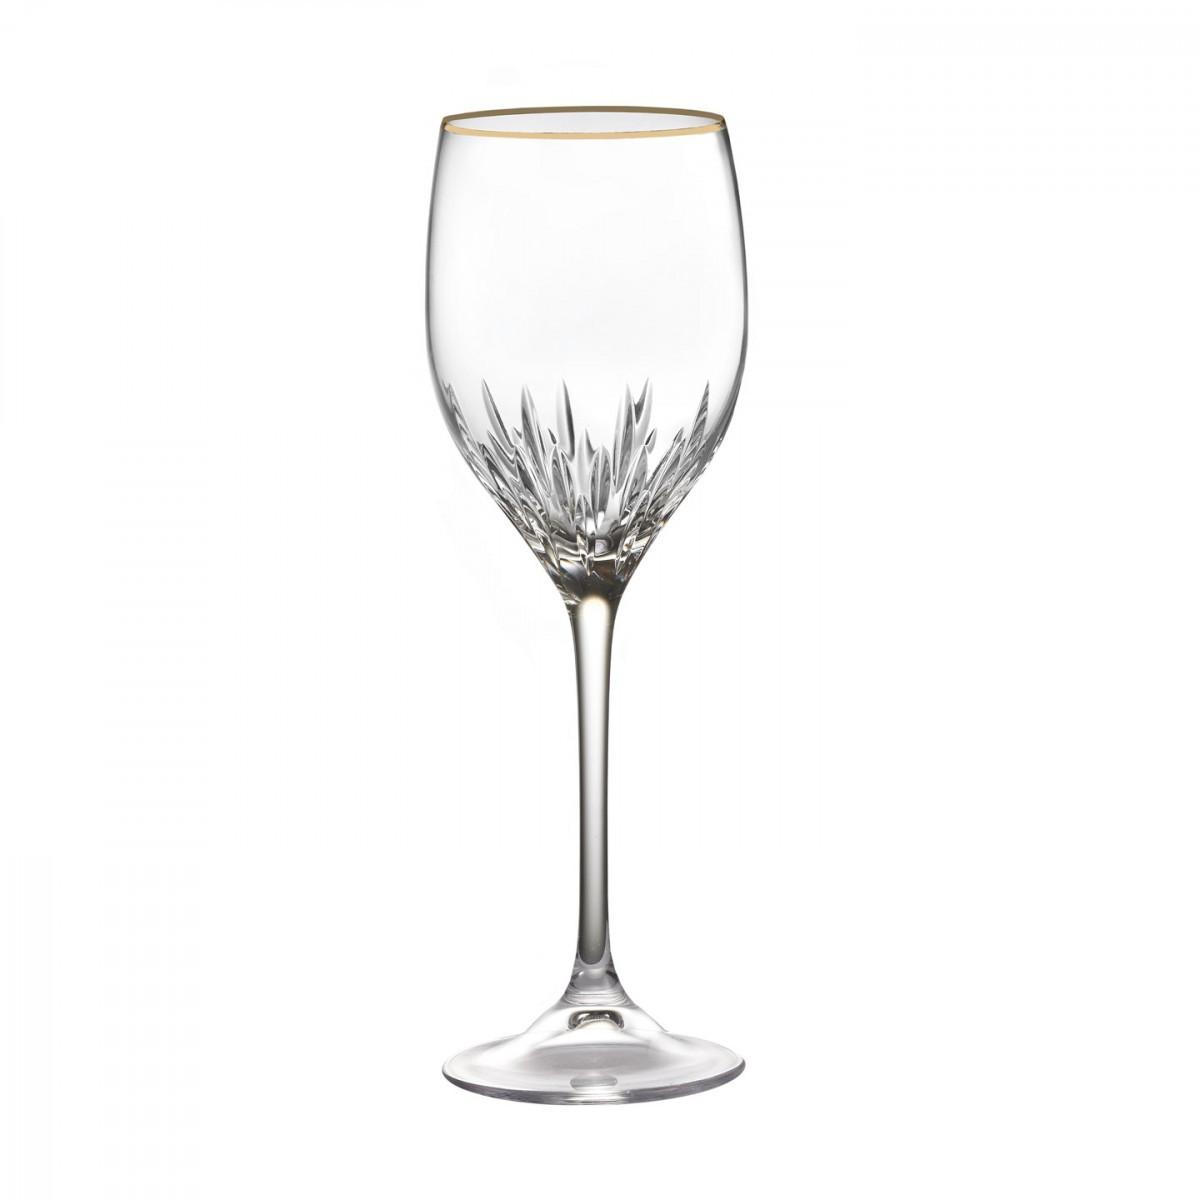 vera wang vase wedgwood of duchesse gold wine vera wang wedgwood us within duchesse gold wine